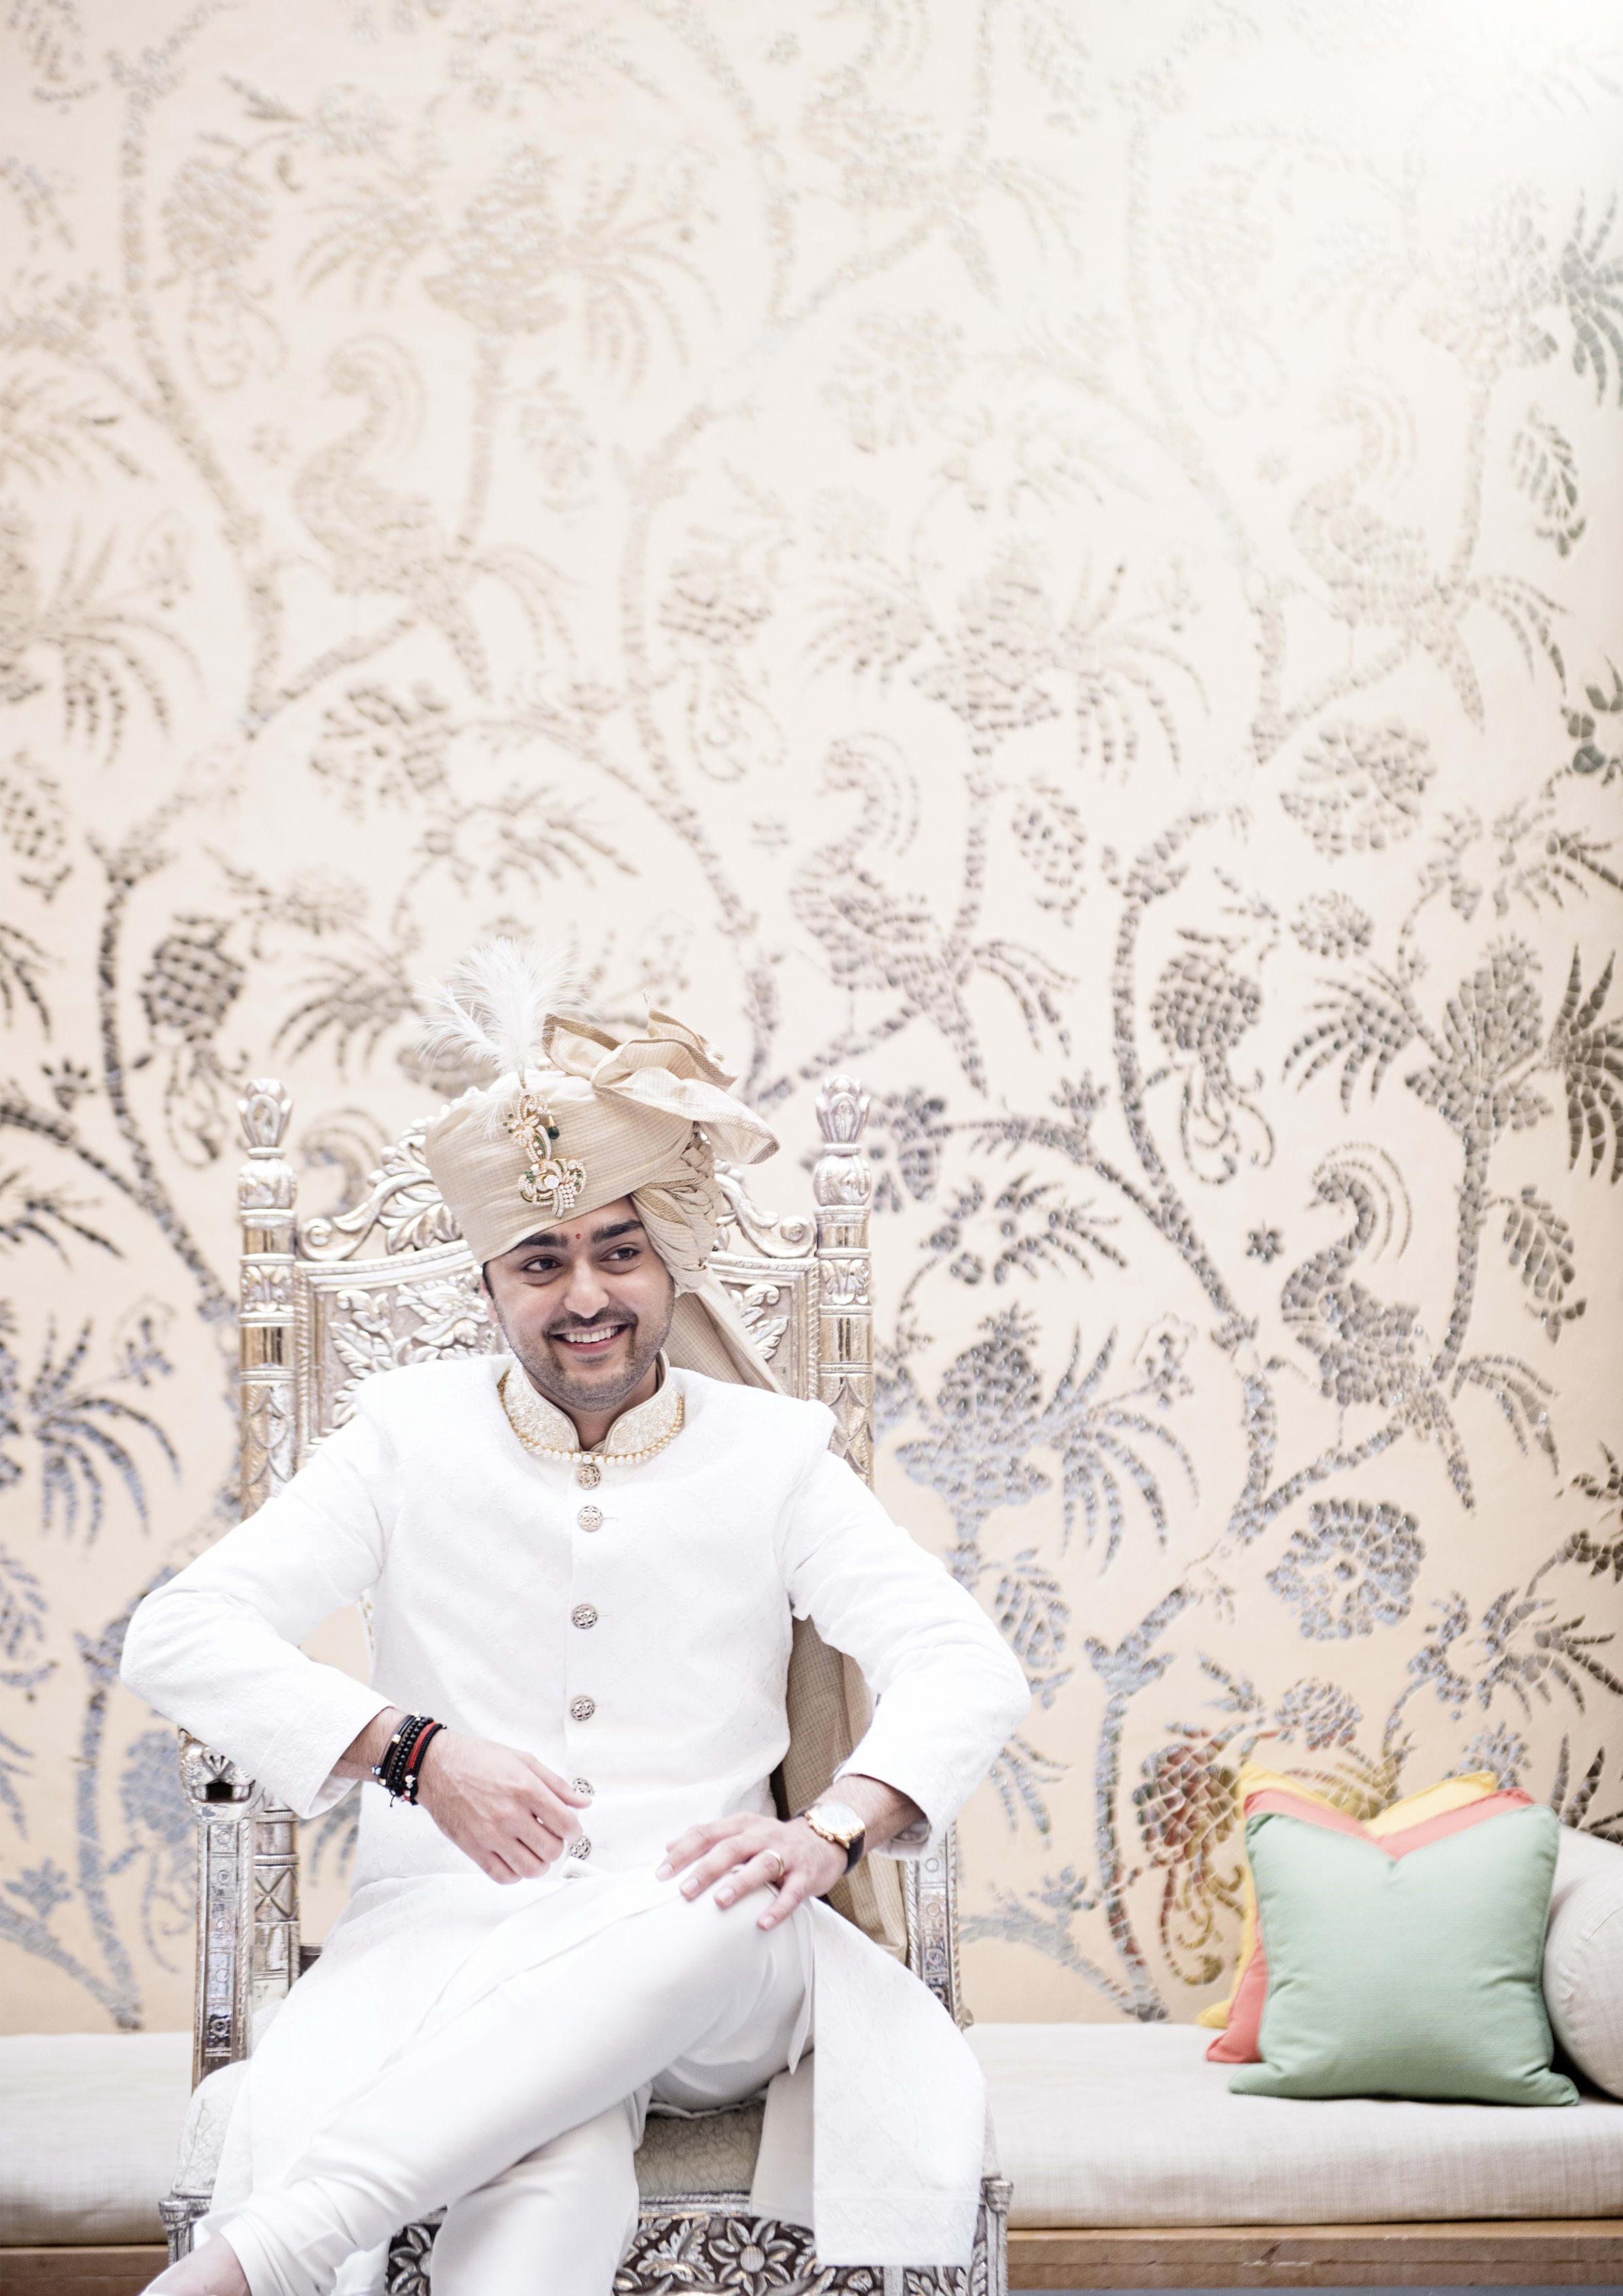 the handsome groom!:tribhovandas bhimji zaveri ltd., namrata soni makup artist